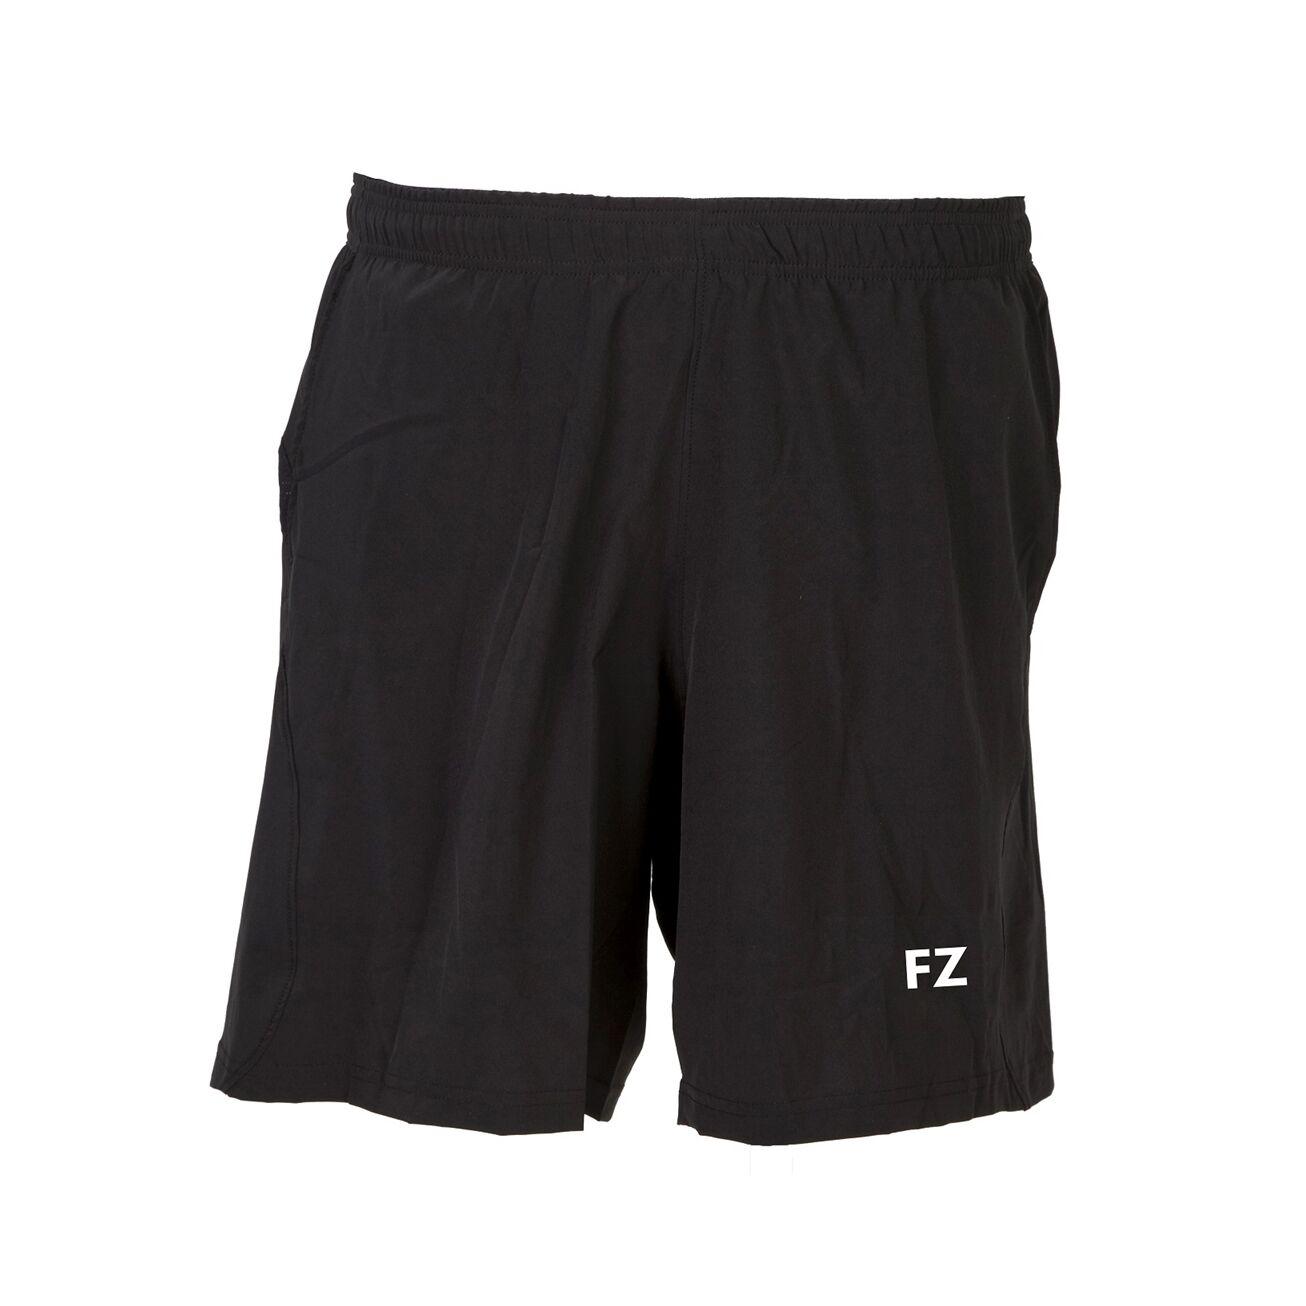 FZ Forza Ajax Shorts Men Black M